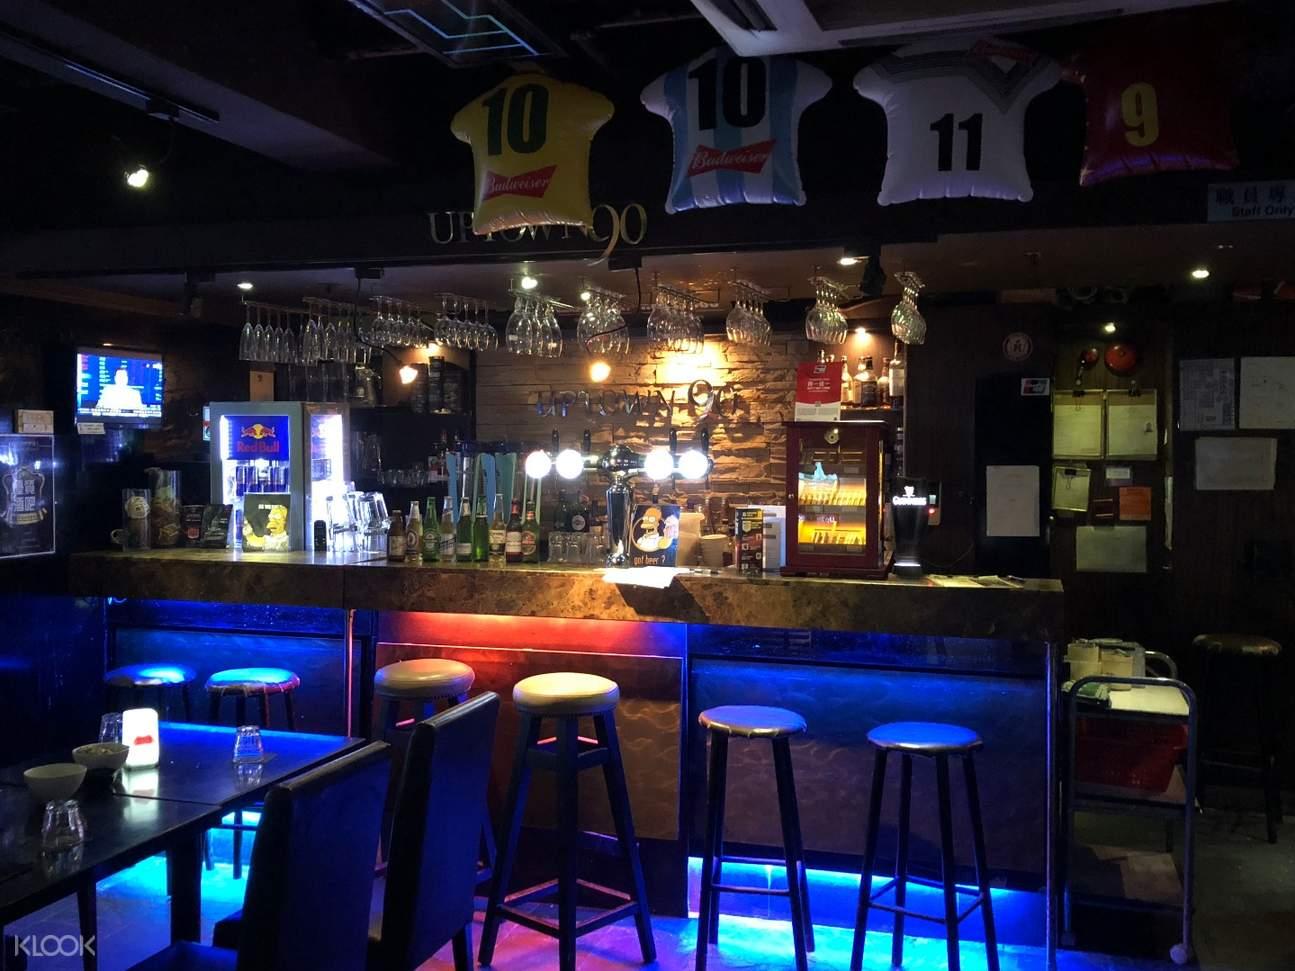 湾仔Uptown 90 Bar & Grill吧台